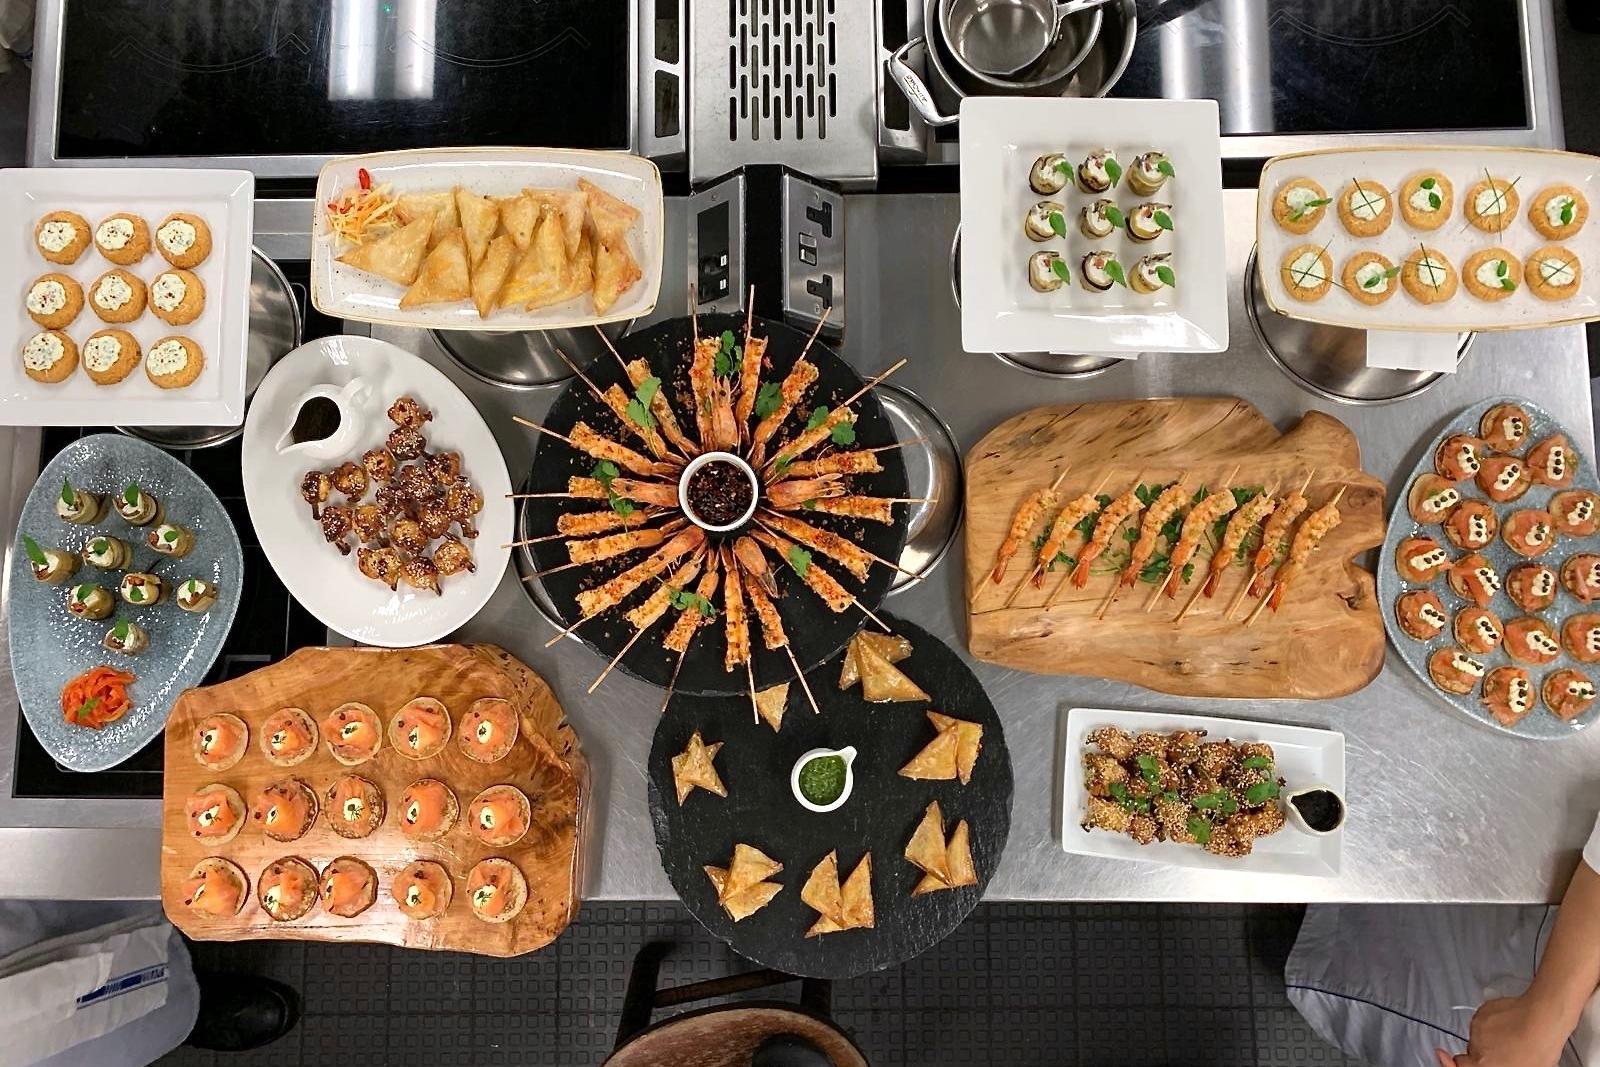 An assortment of hot and cold canapés